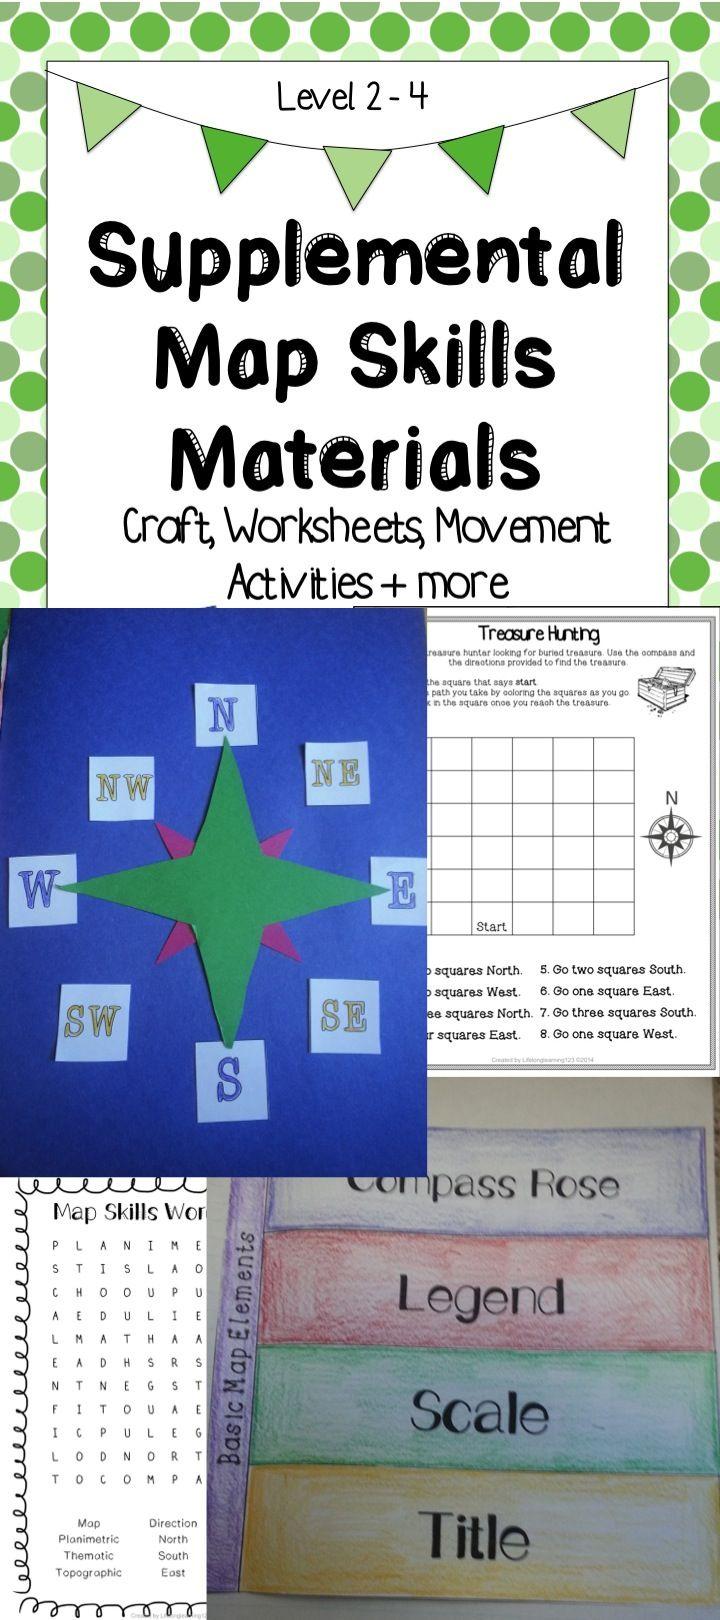 Supplemental Map Skills Materials Craft Worksheets Movement Activities More